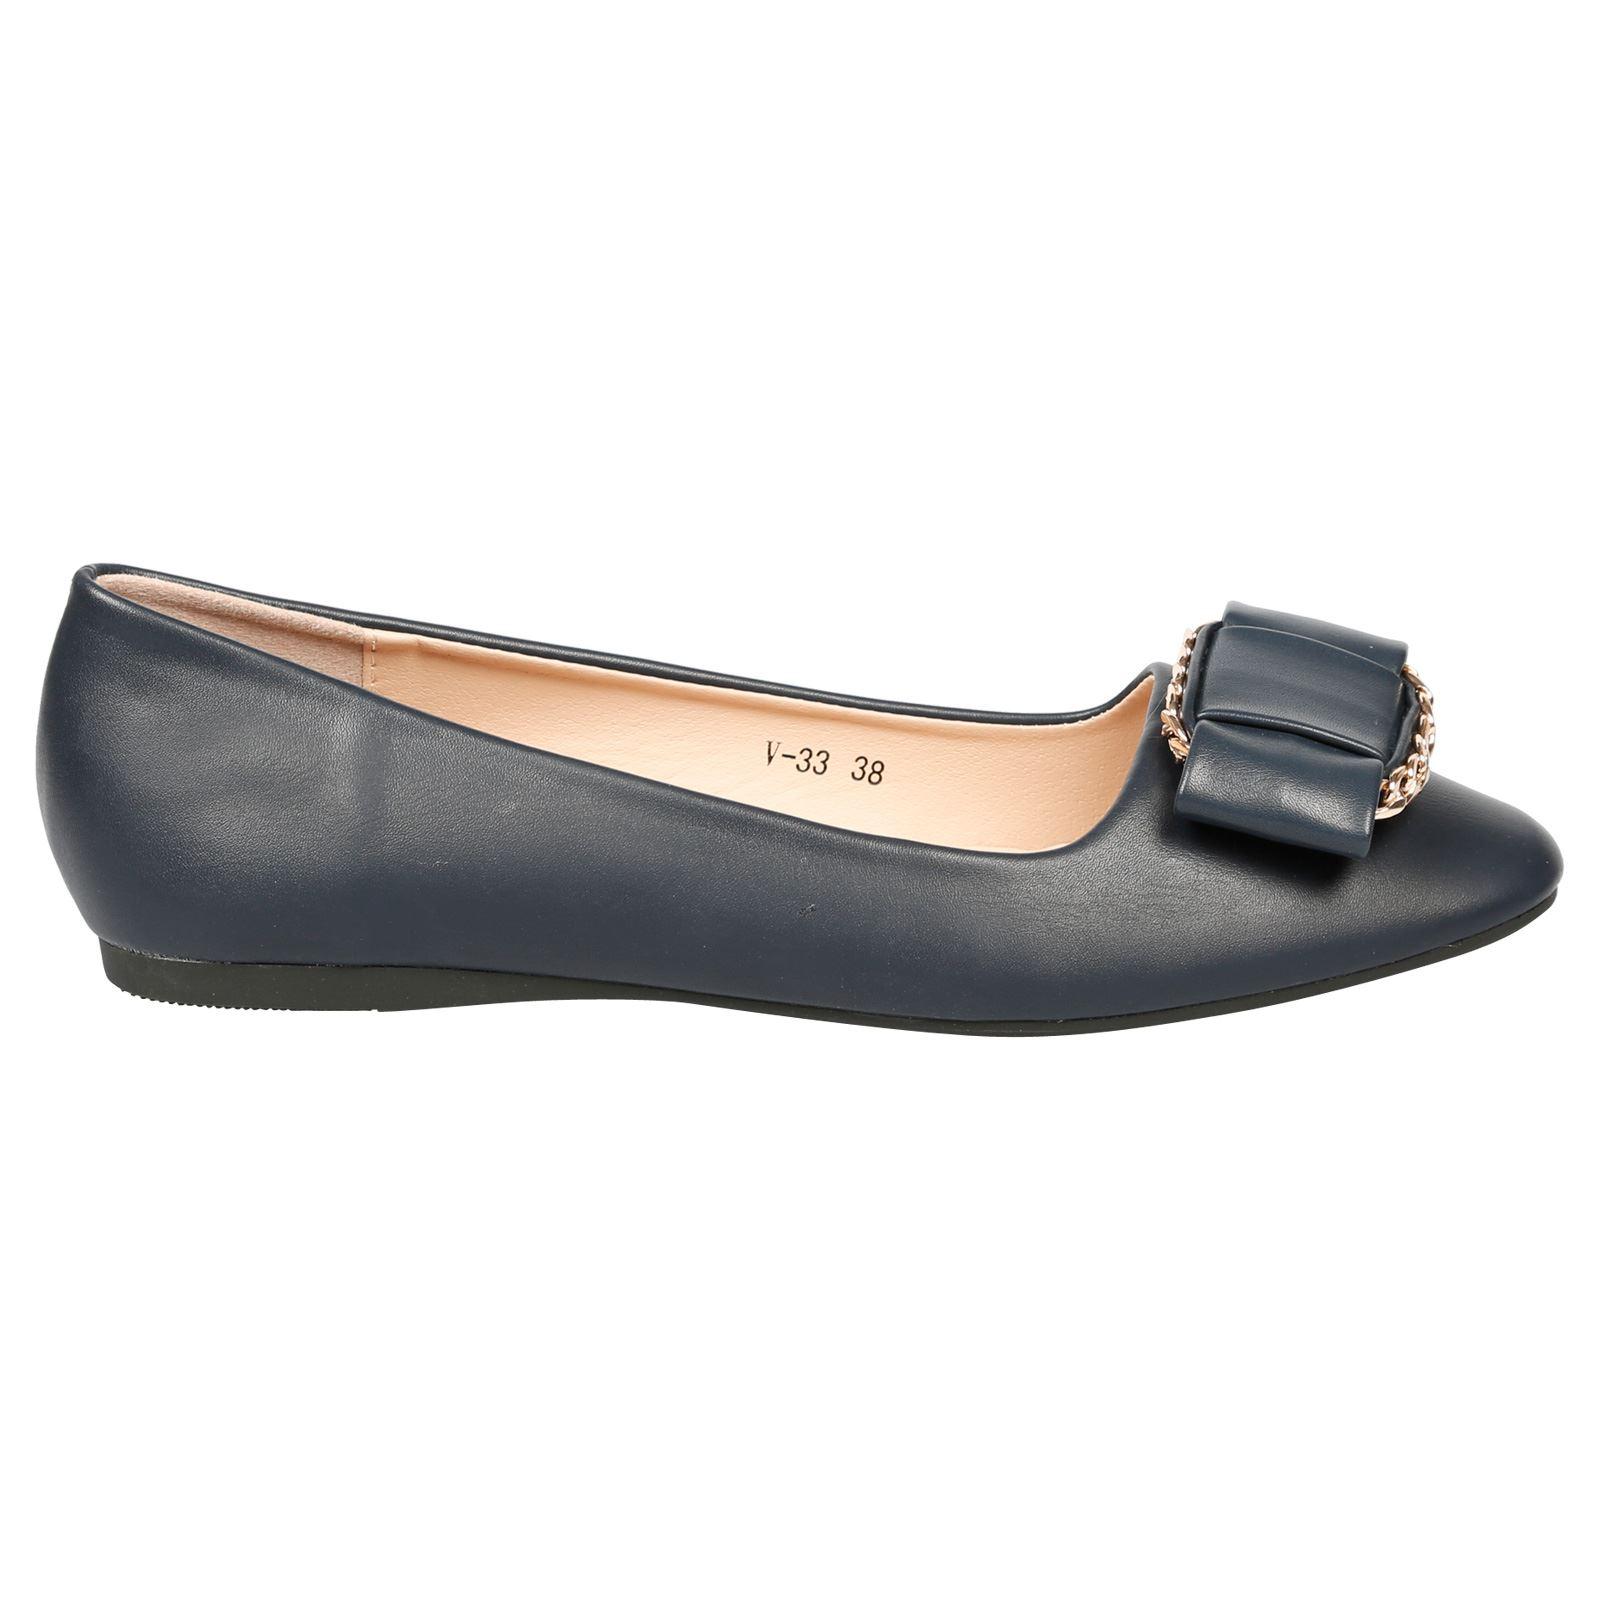 Damen Ballerinas  zapatos  36 Loafers Flats 741m Pumps 36  37 38 39 40 41 ac648c